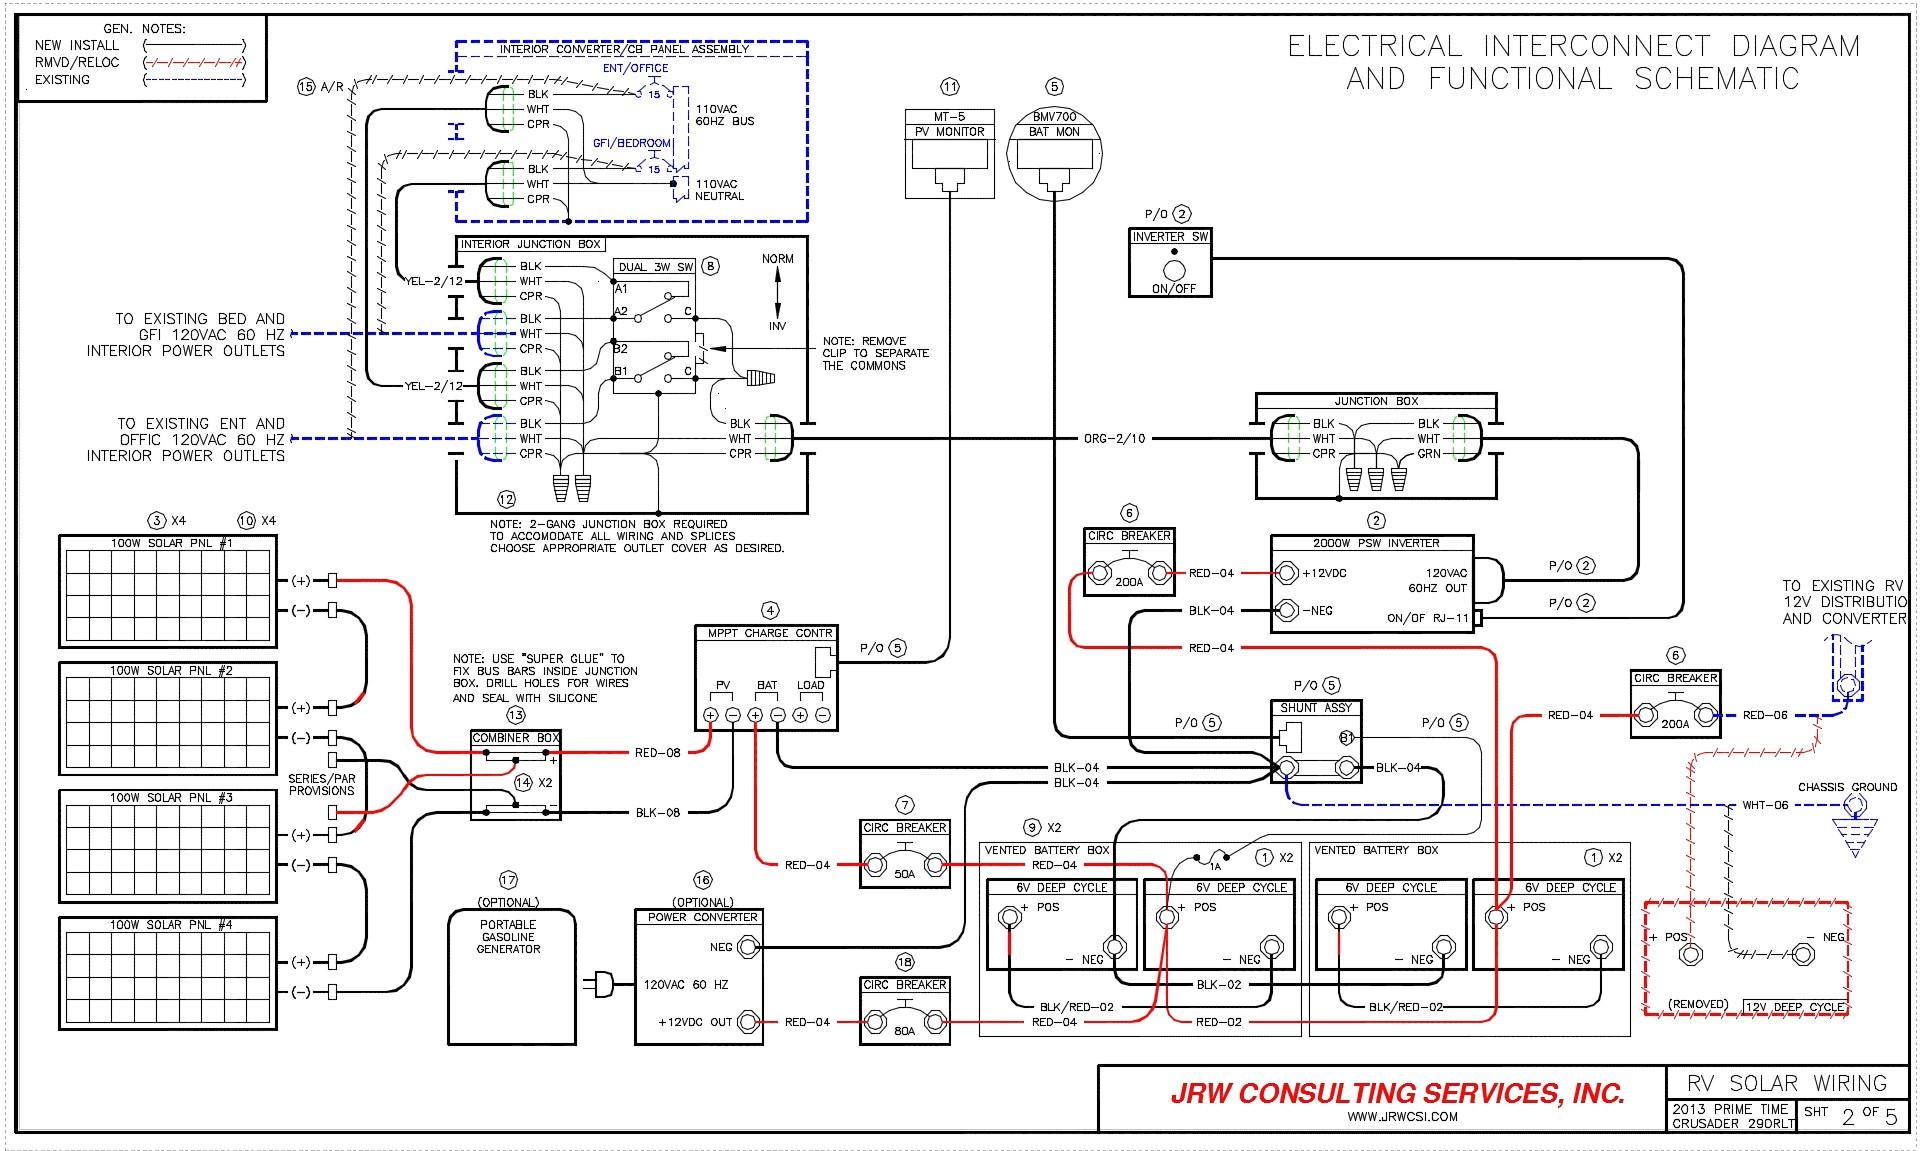 Fleetwood Southwind Wiring Diagram | Wiring Diagram - Fleetwood Motorhome Wiring Diagram